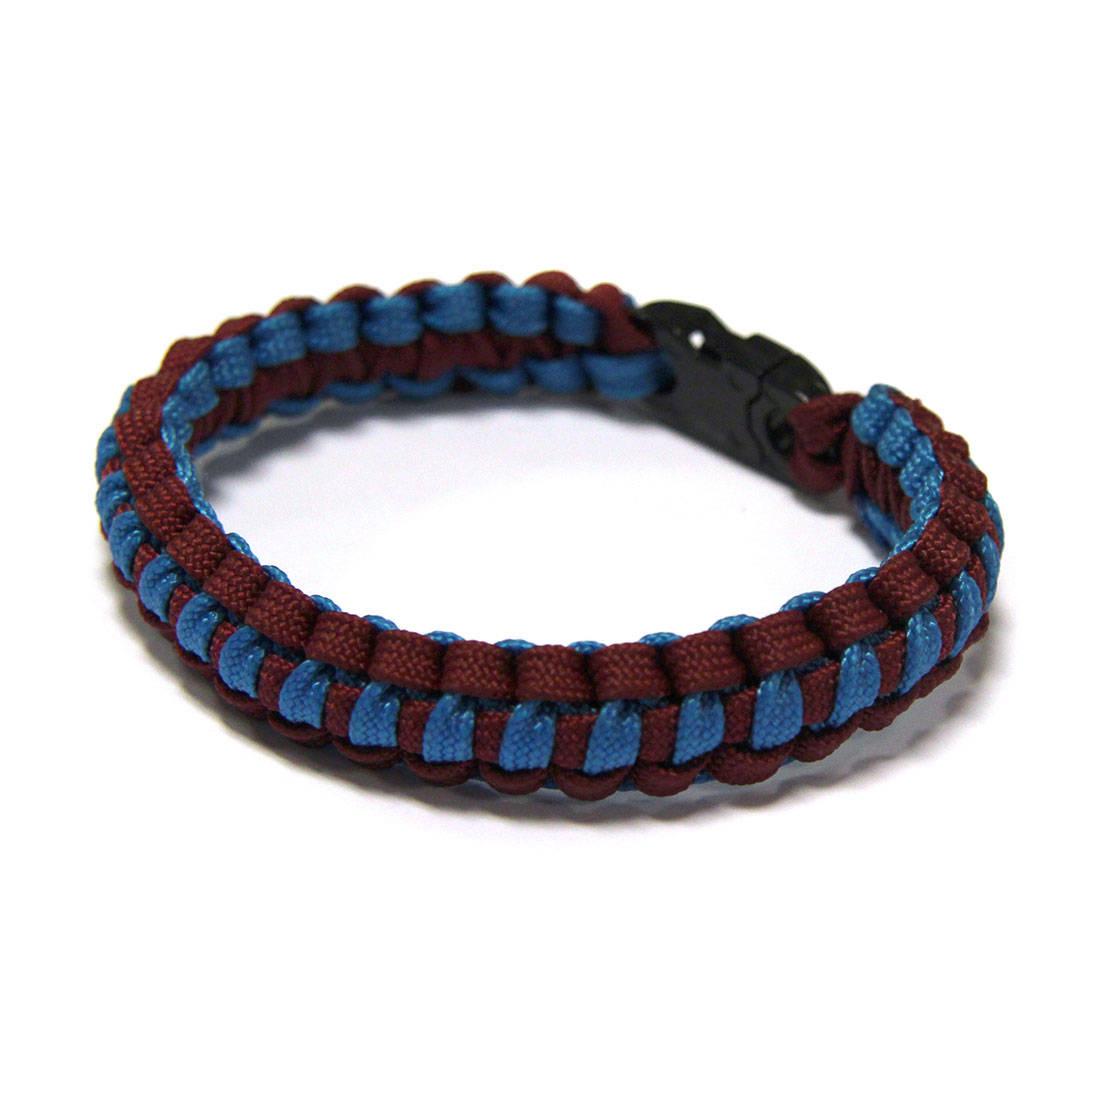 Lightweight Paracord Survival Bracelet - Maroon/Blue